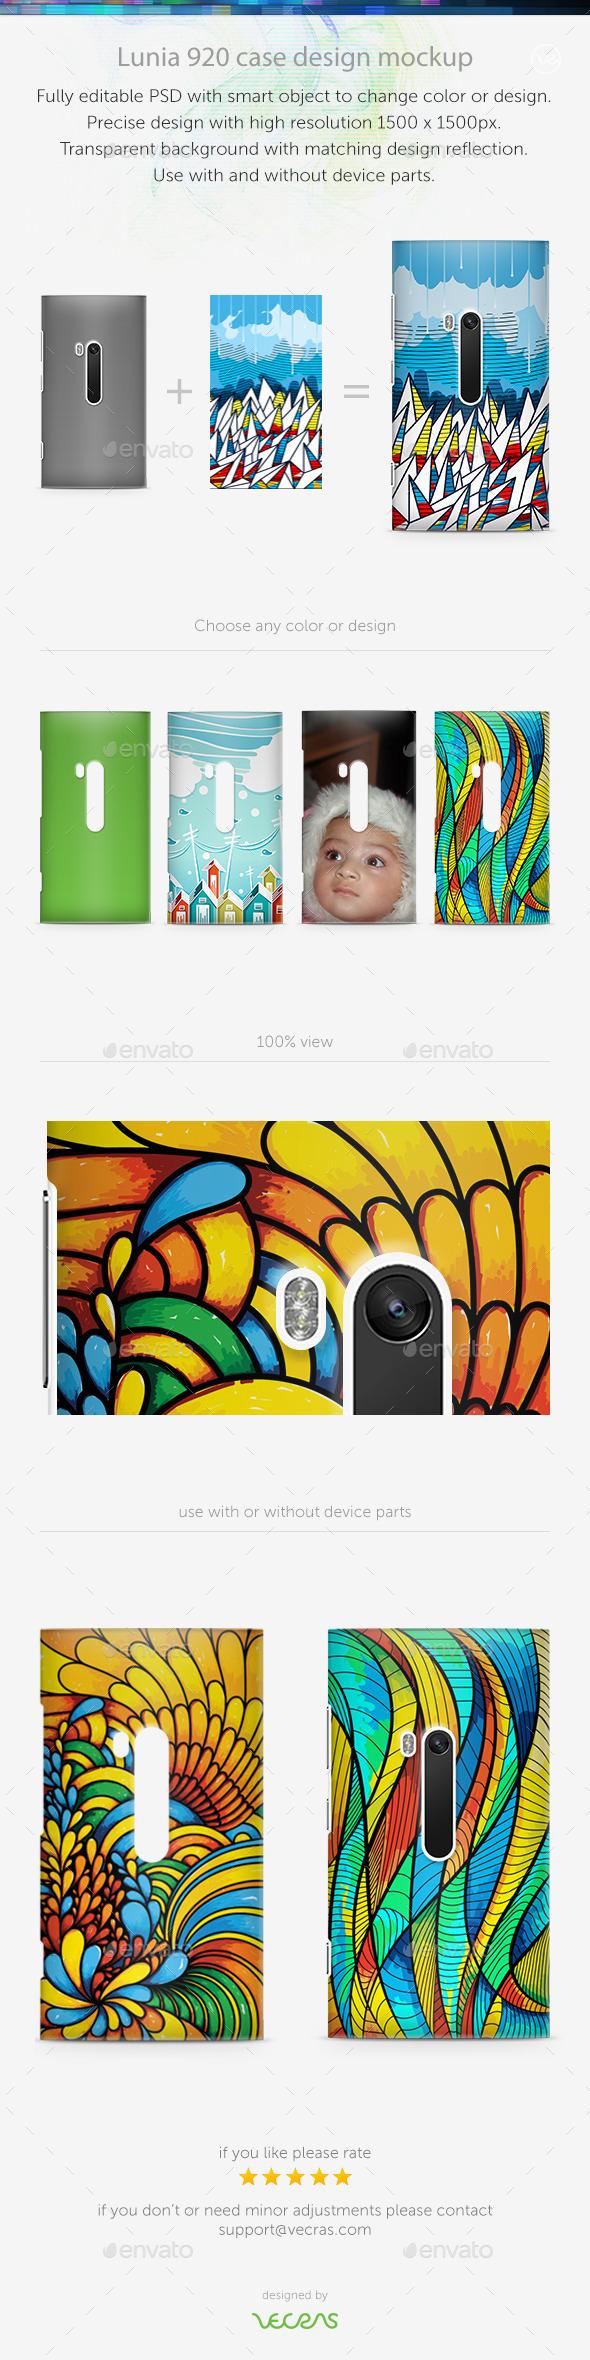 Lunia920 Case Design Mockup